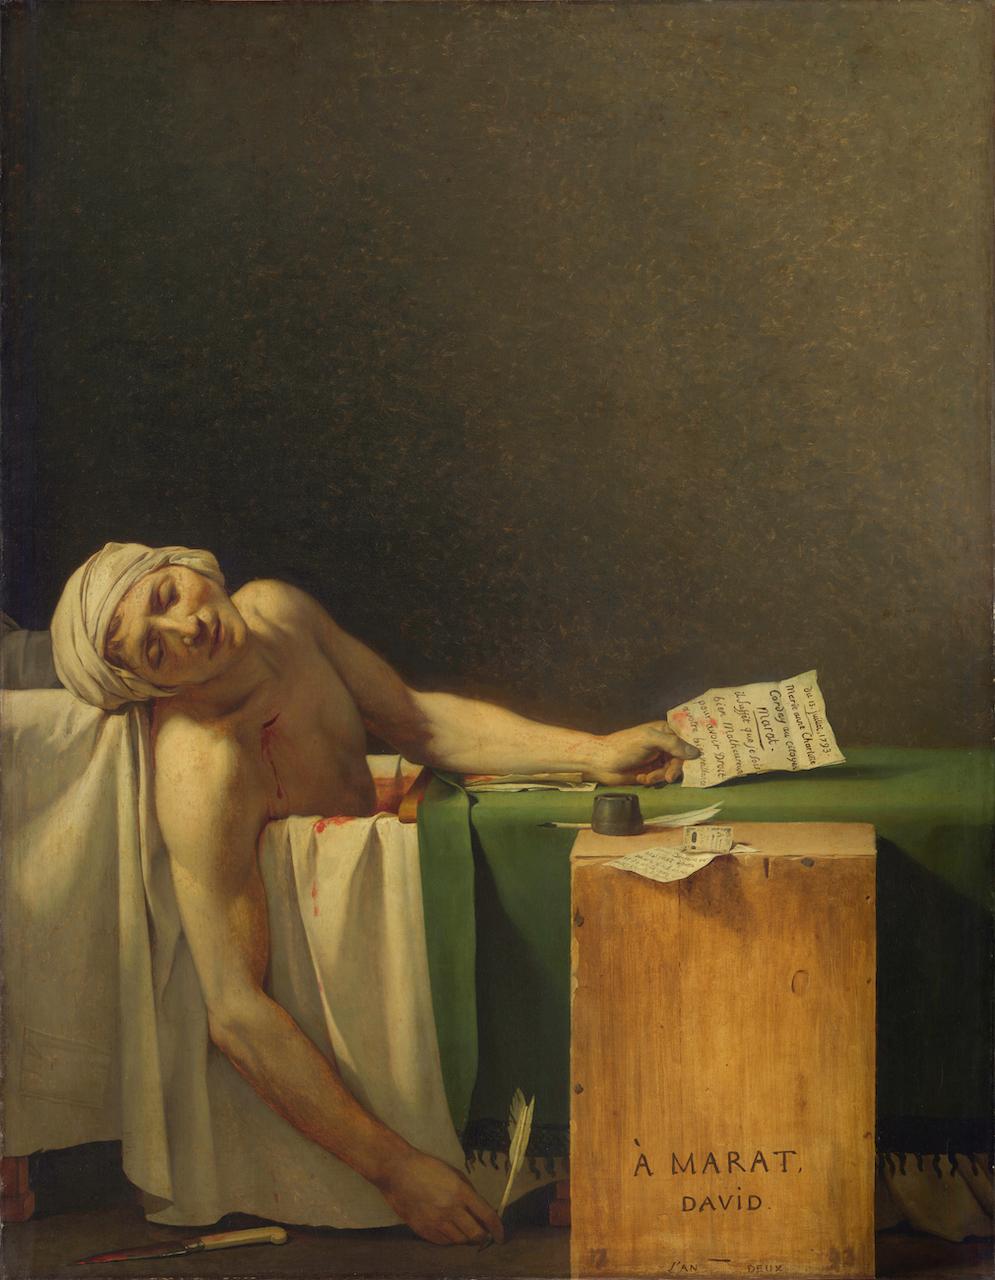 Jacques-Louis David. Tod des Marat. 1793. Öl / Leinwand. 165 x 128cm